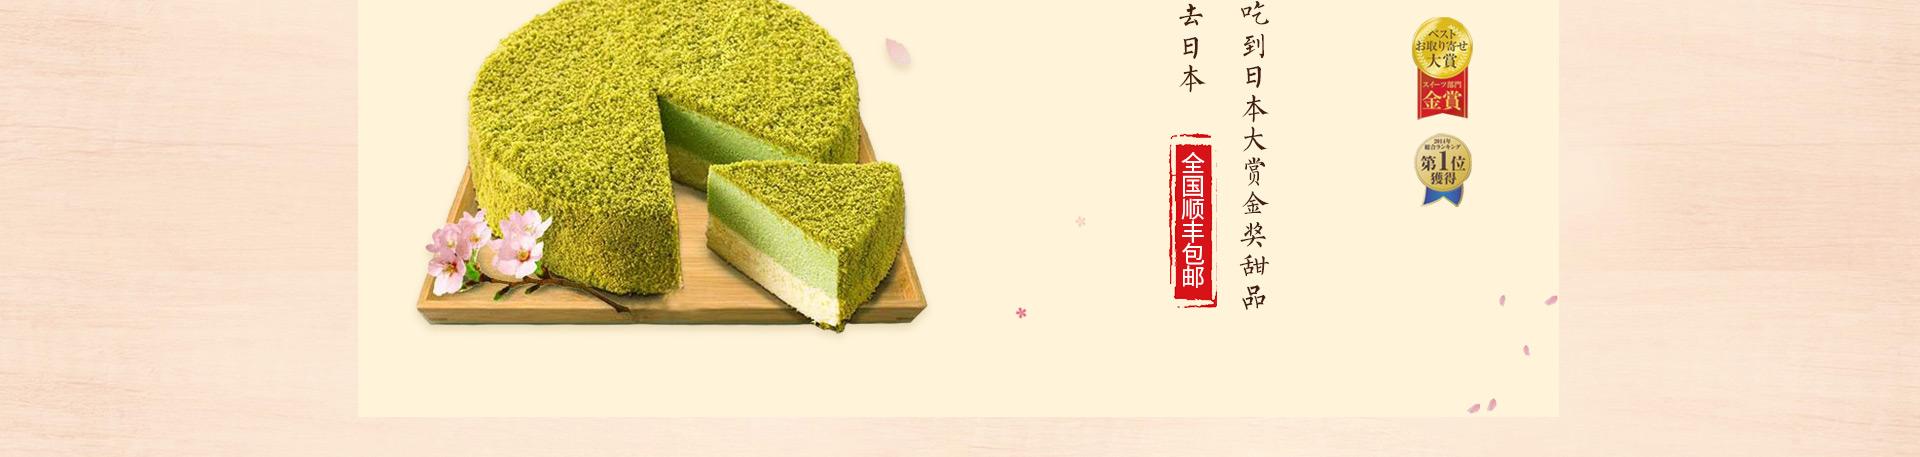 ebeecake小蜜蜂蛋糕 北海道抹茶双层芝士蛋糕